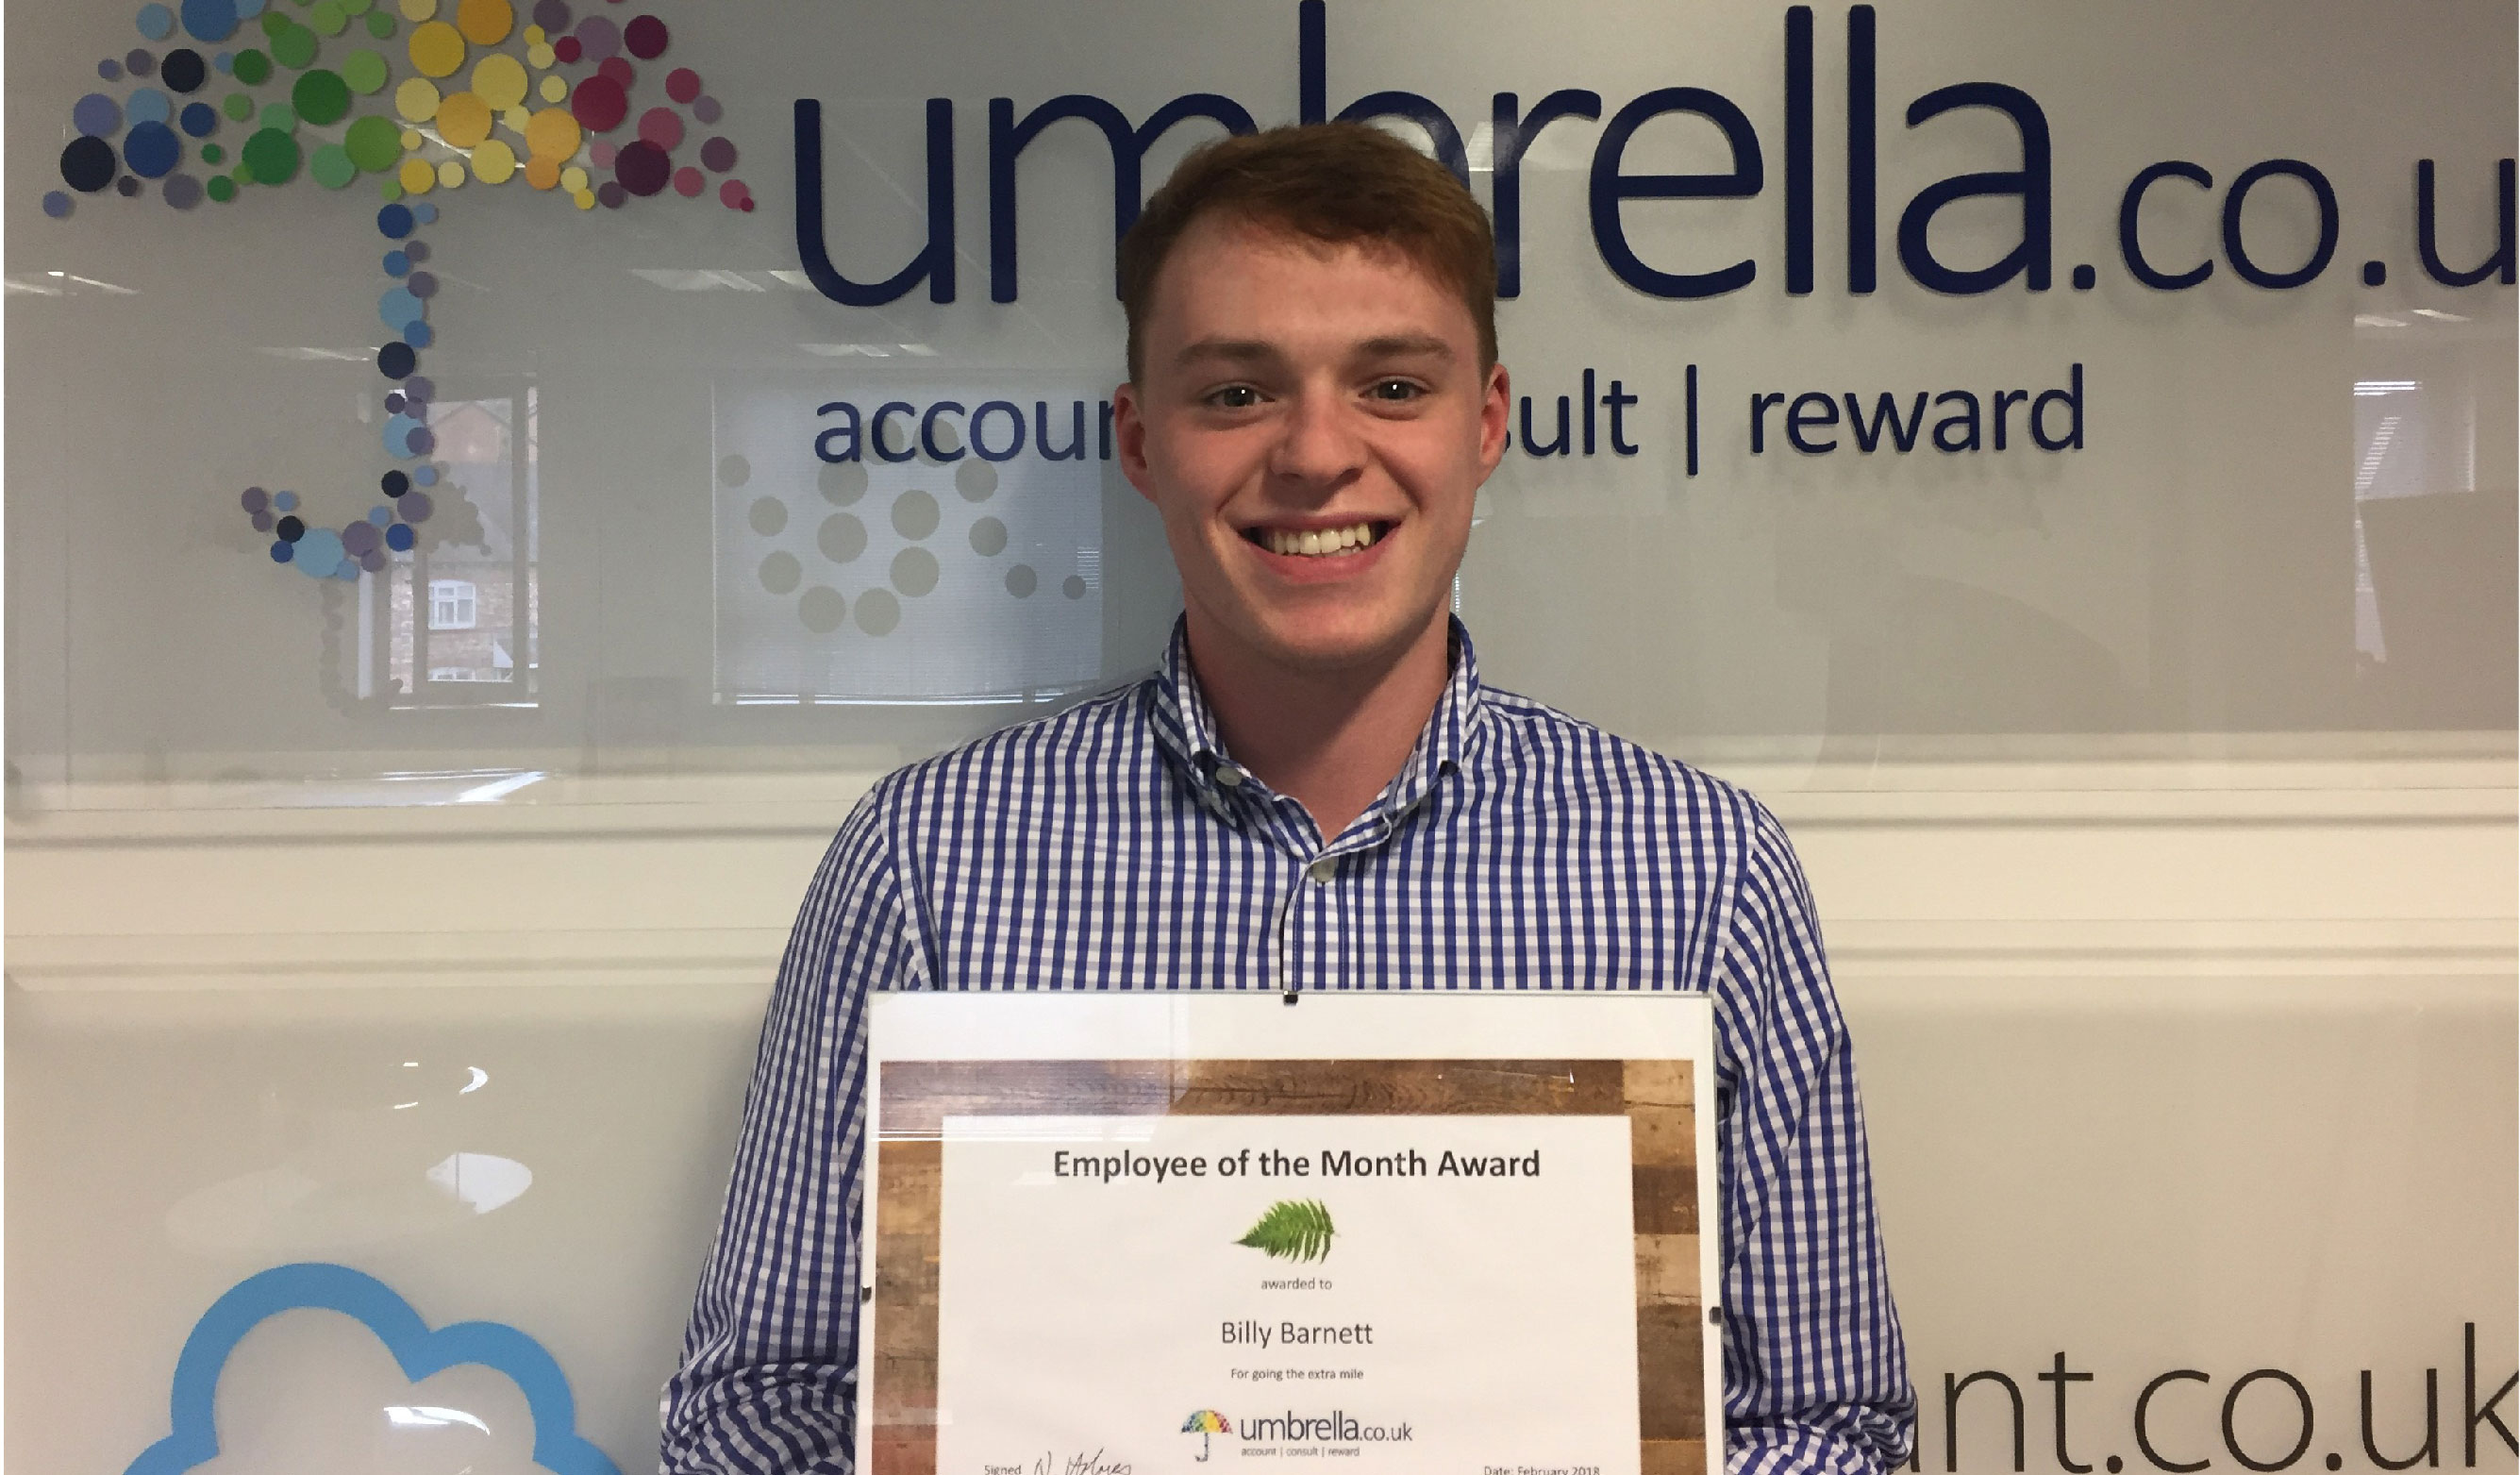 Billy Barnett Wins Umbrella.co.uk February Employee of the Month